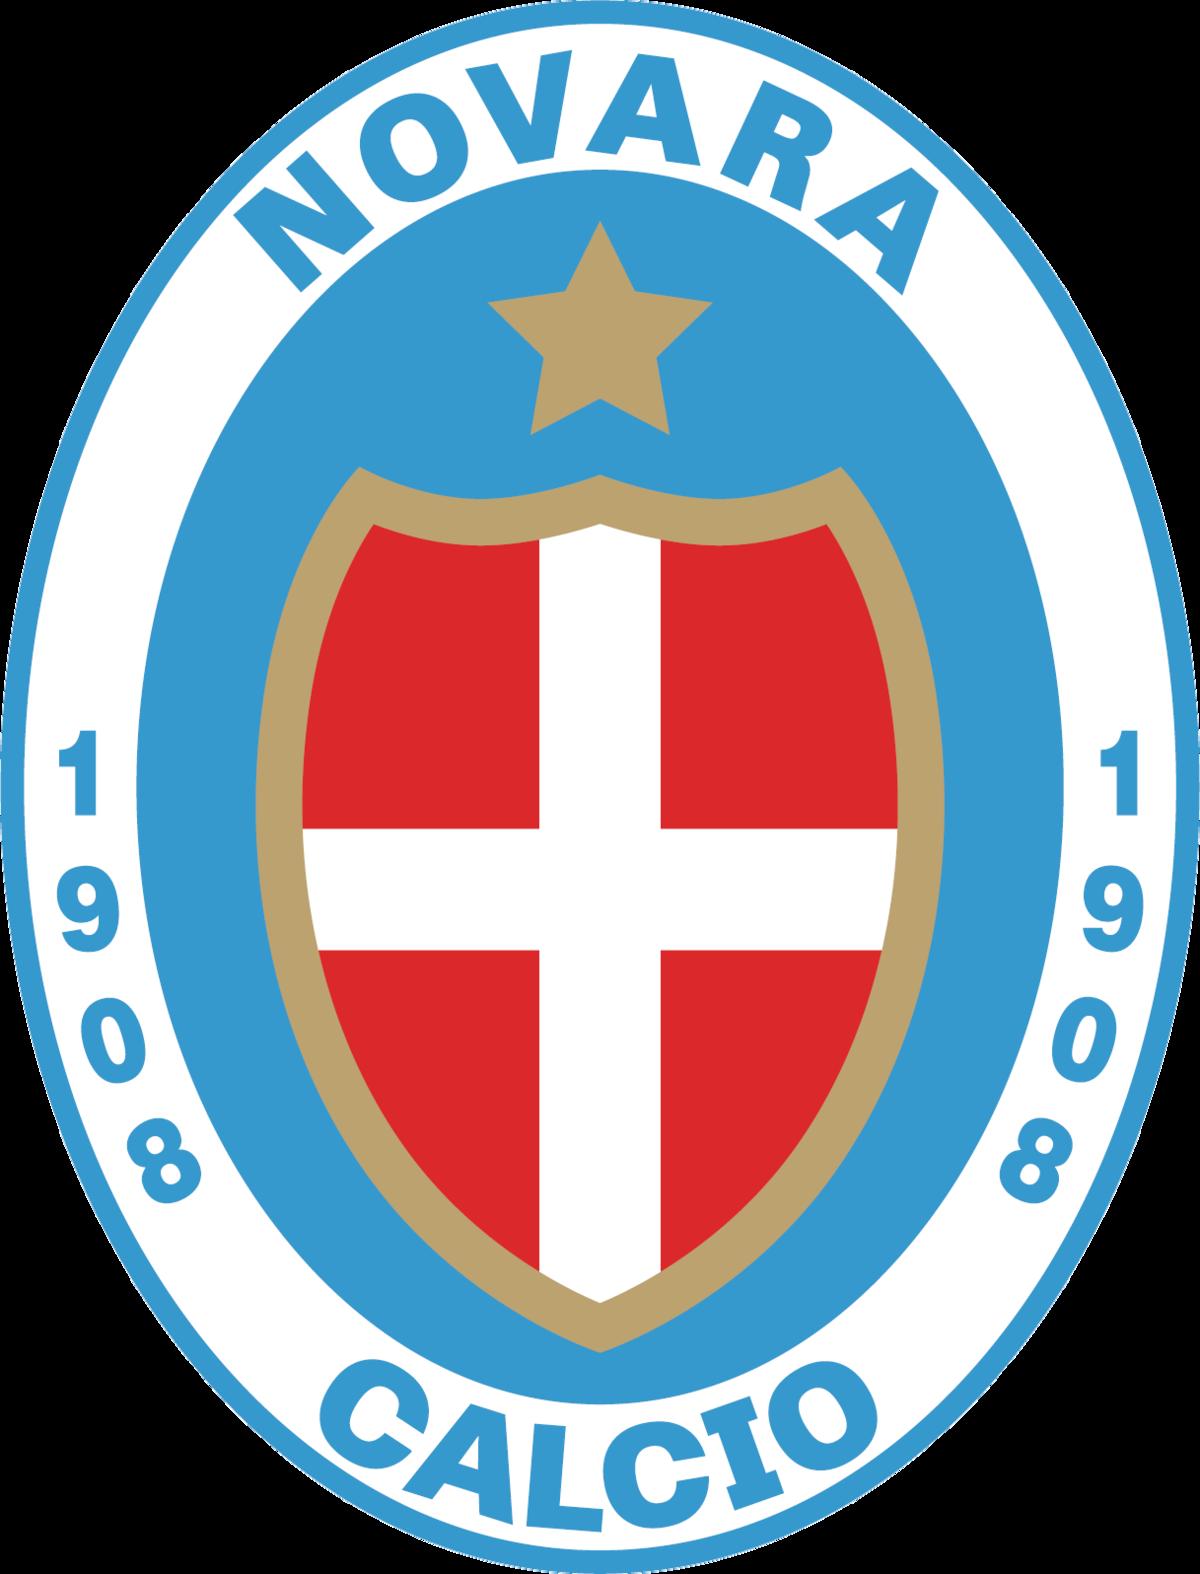 Novara Calcio Wikipedia